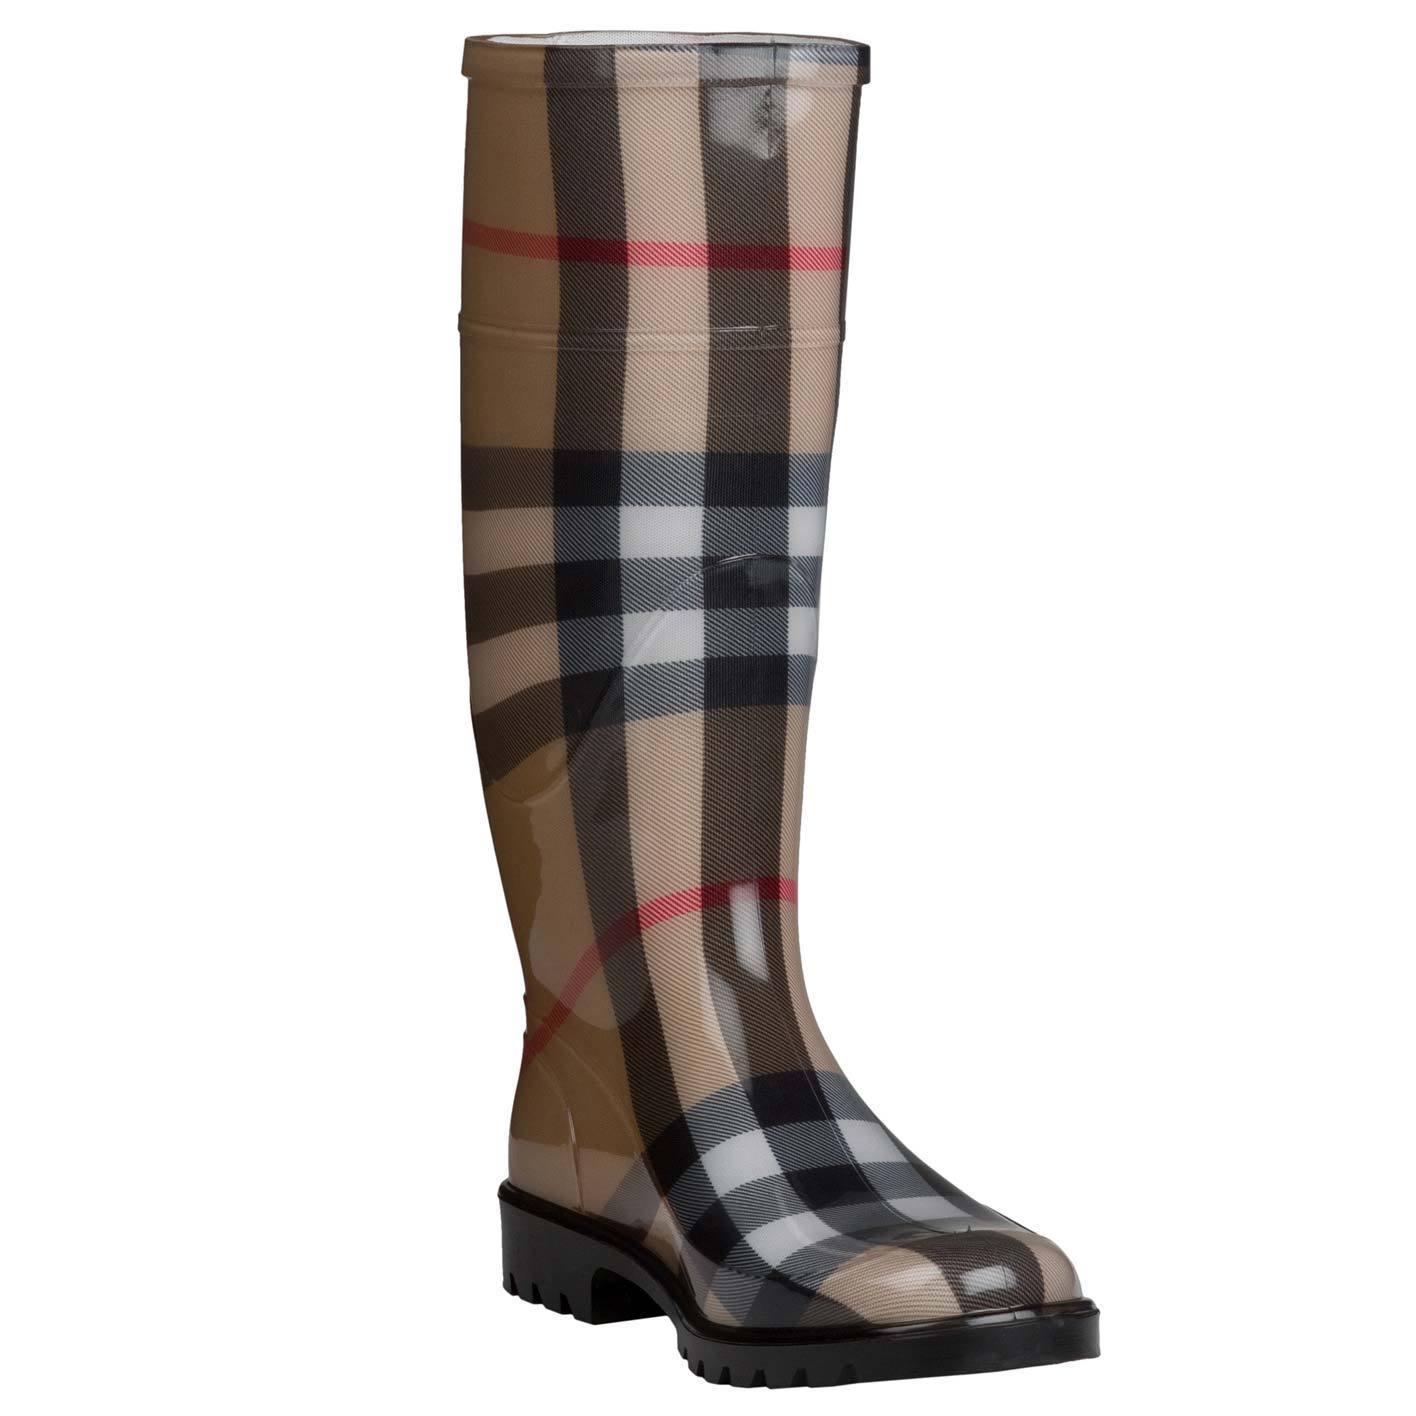 Innovative Top 10 Best Rain Boots For Women 2015 Reviews